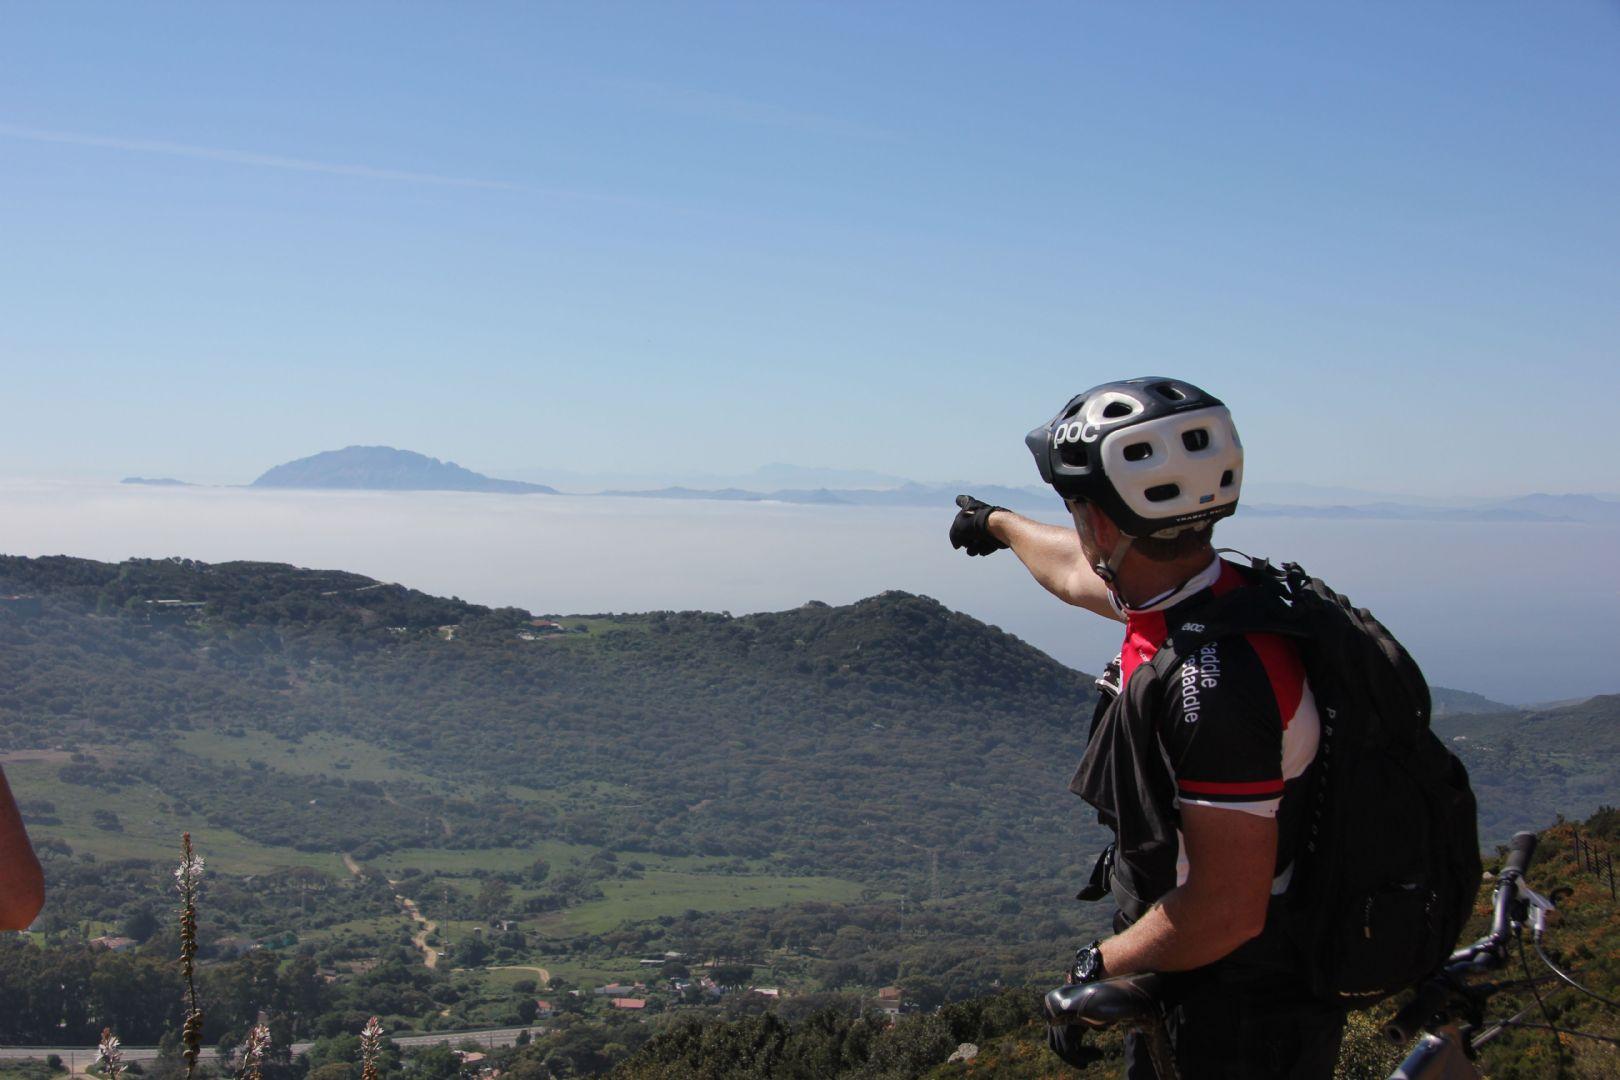 IMG_9268.JPG - Spain - Trans Andaluz - Guided Mountain Bike Holiday - Mountain Biking